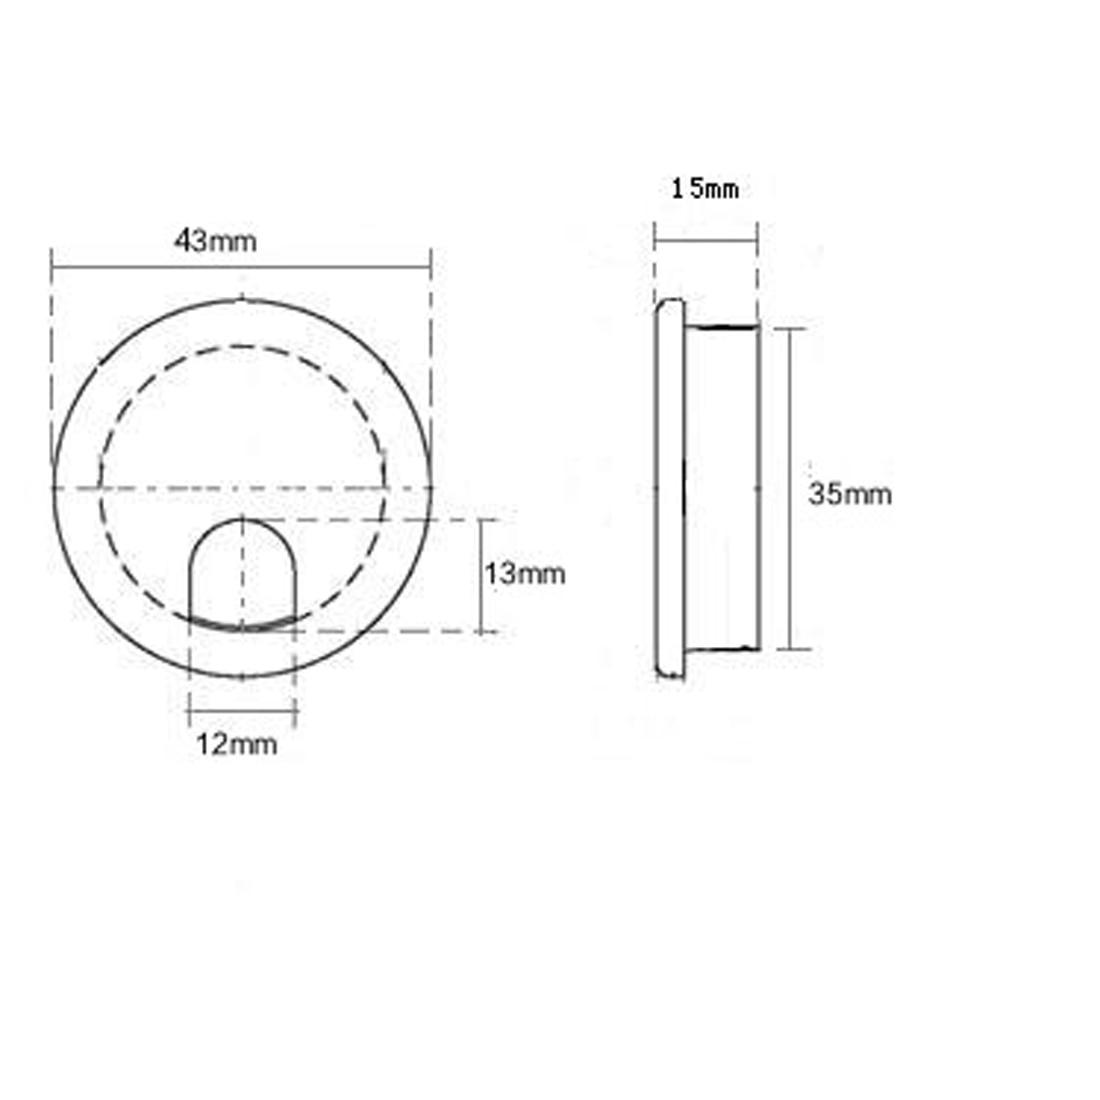 uxcell wiring diagram wiring diagramuxcell wiring diagram wiring diagram automotiveuxcell wiring diagram online wiring diagramuxcell wiring [ 1100 x 1100 Pixel ]